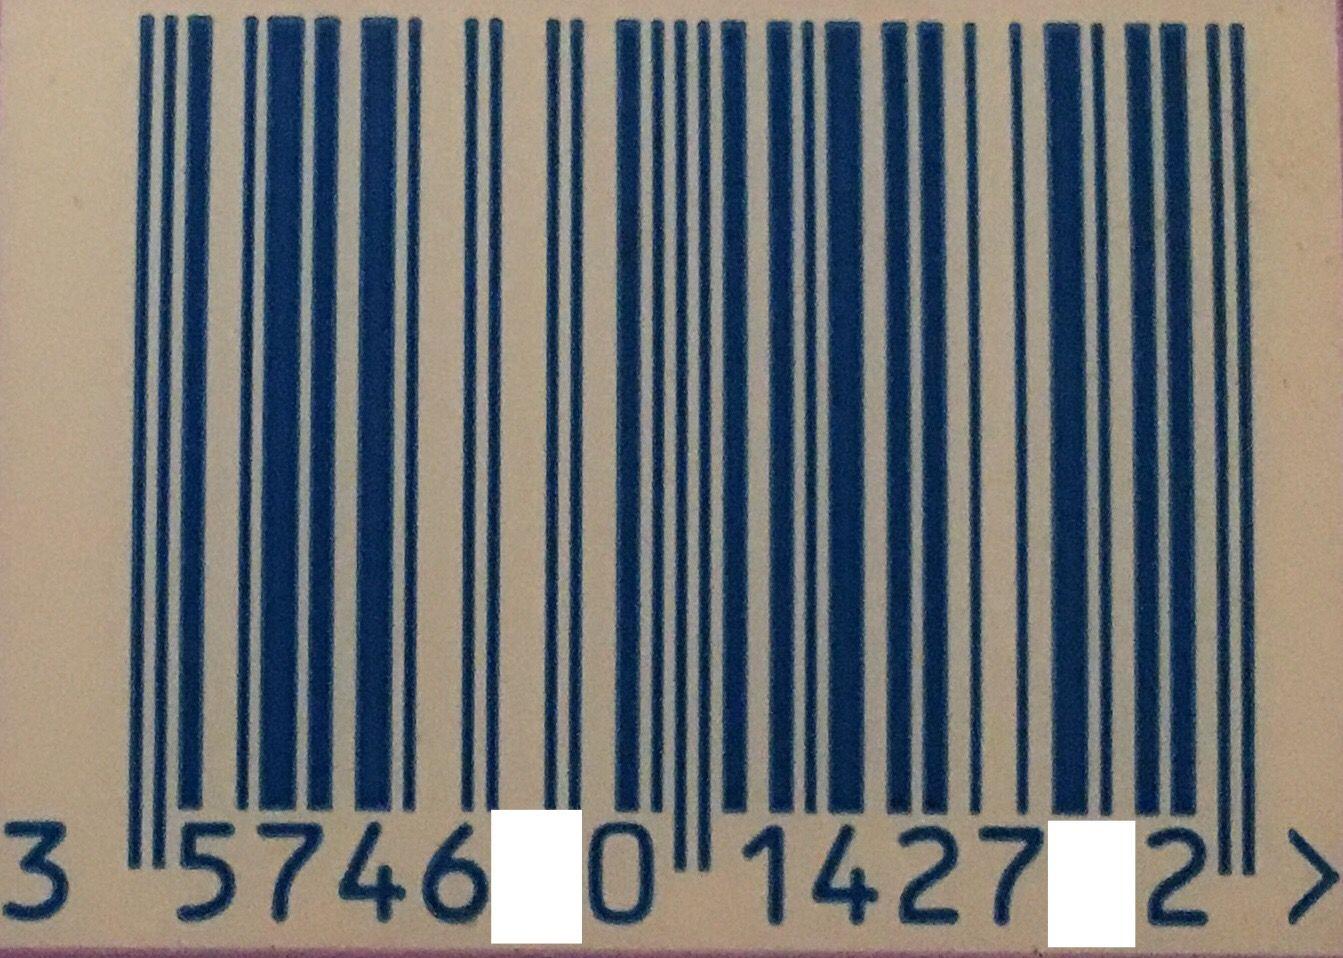 7098F74C-B4CE-4A65-8C81-78DFC8745463.jpeg